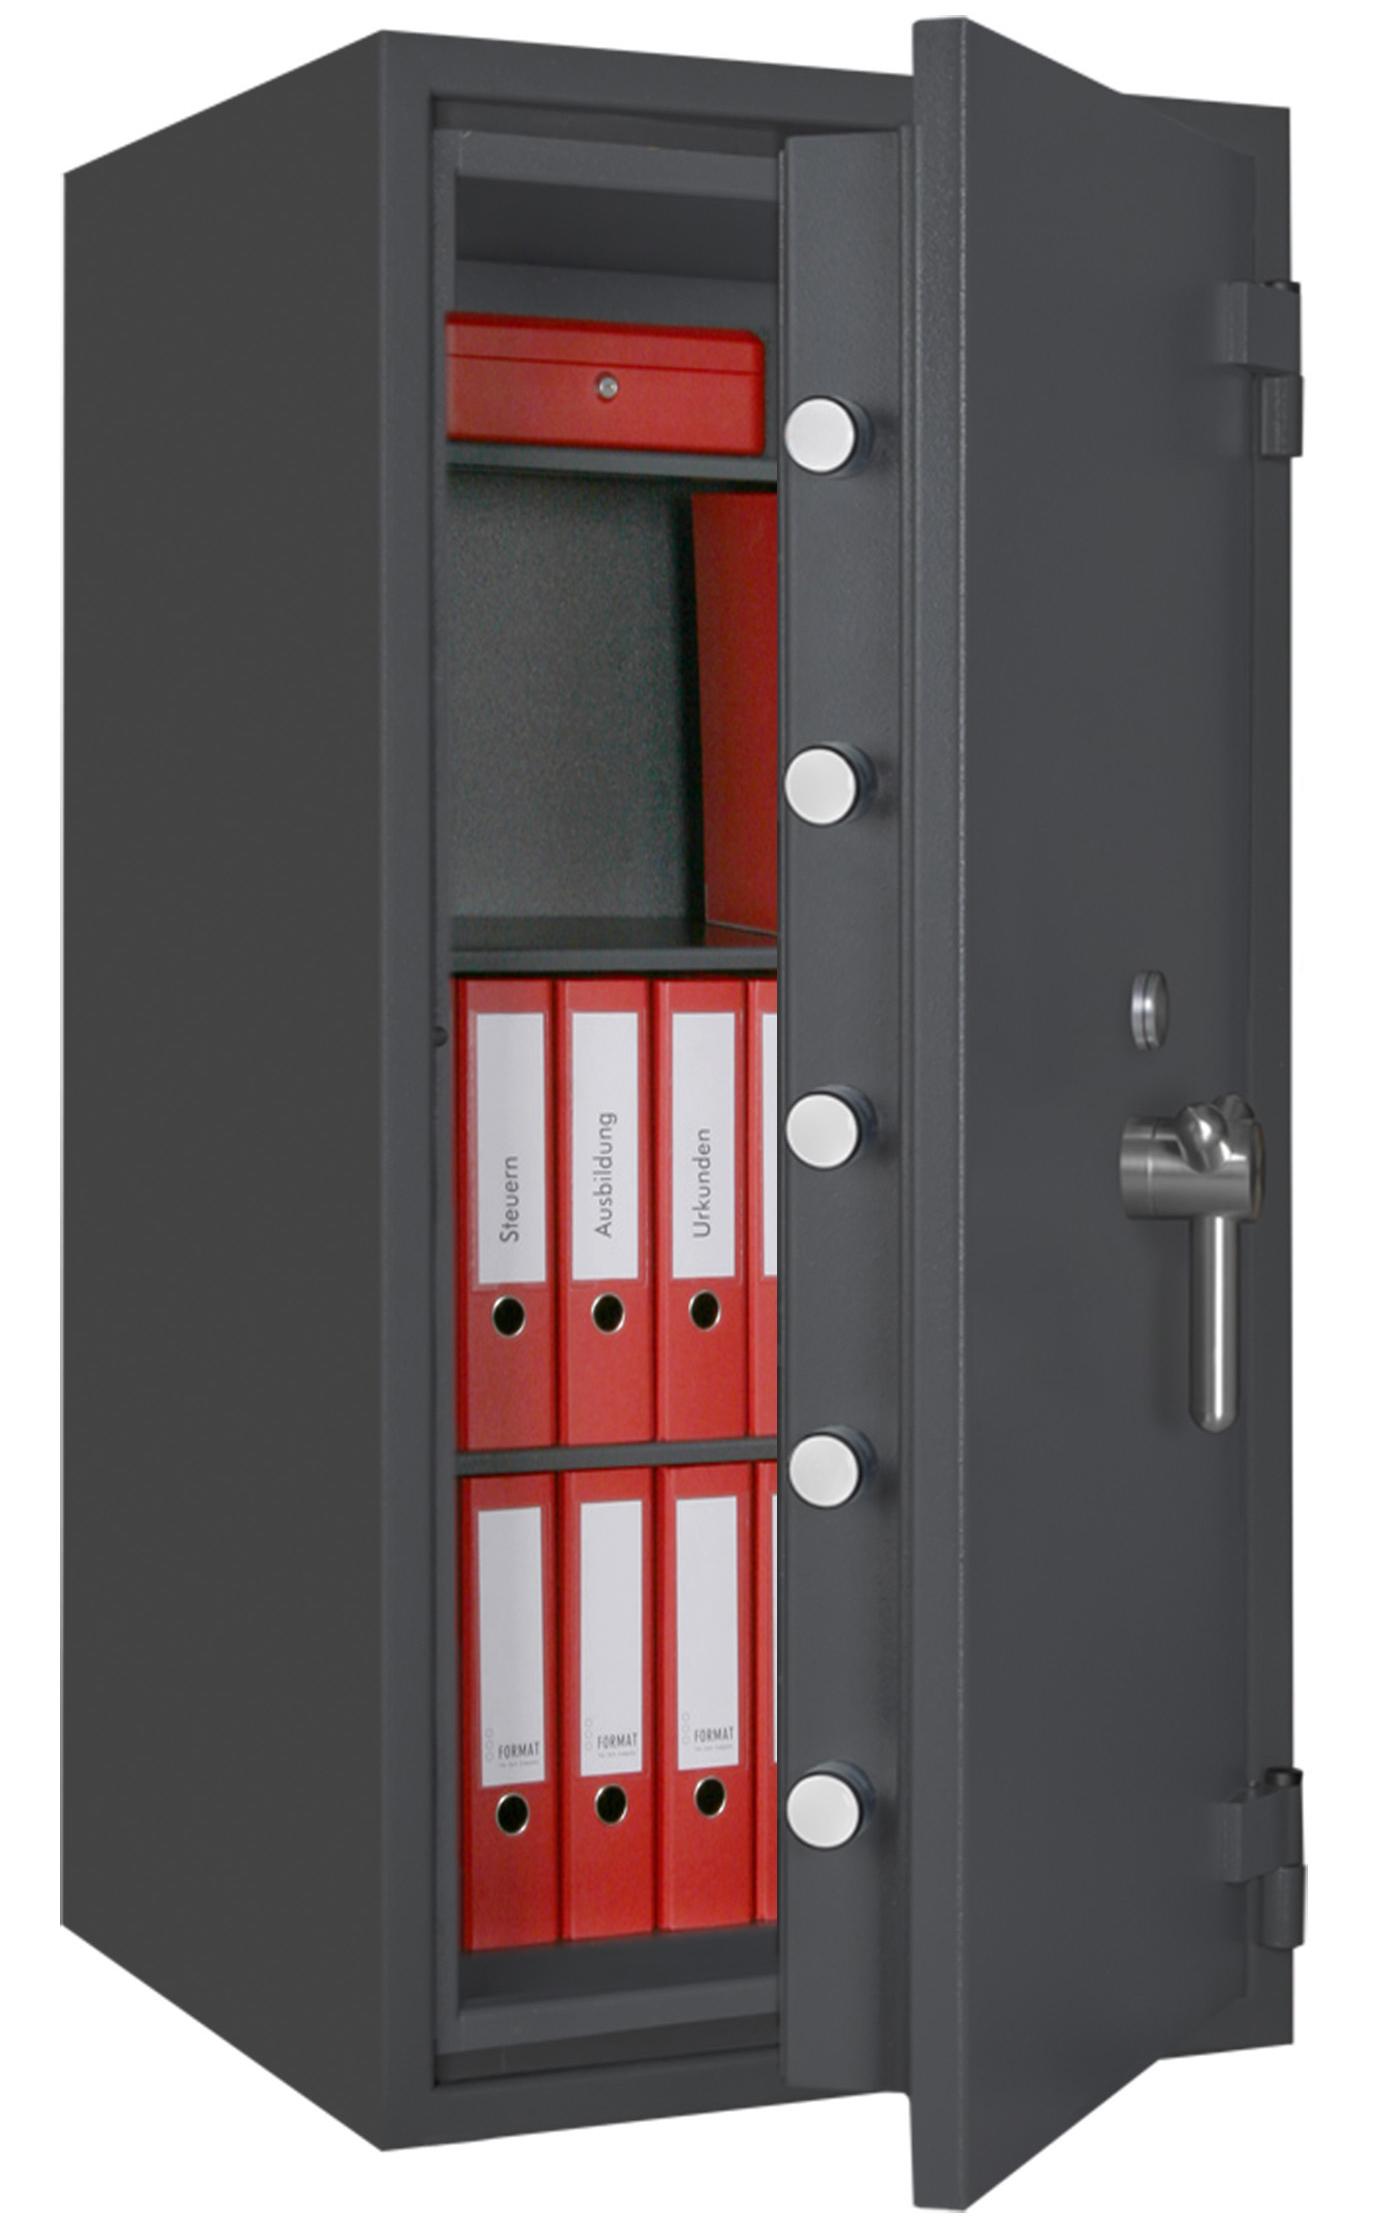 format wertschutzresor rubin pro 65 t tresor vds klasse 3 widerstandsgrad en 1143 1. Black Bedroom Furniture Sets. Home Design Ideas